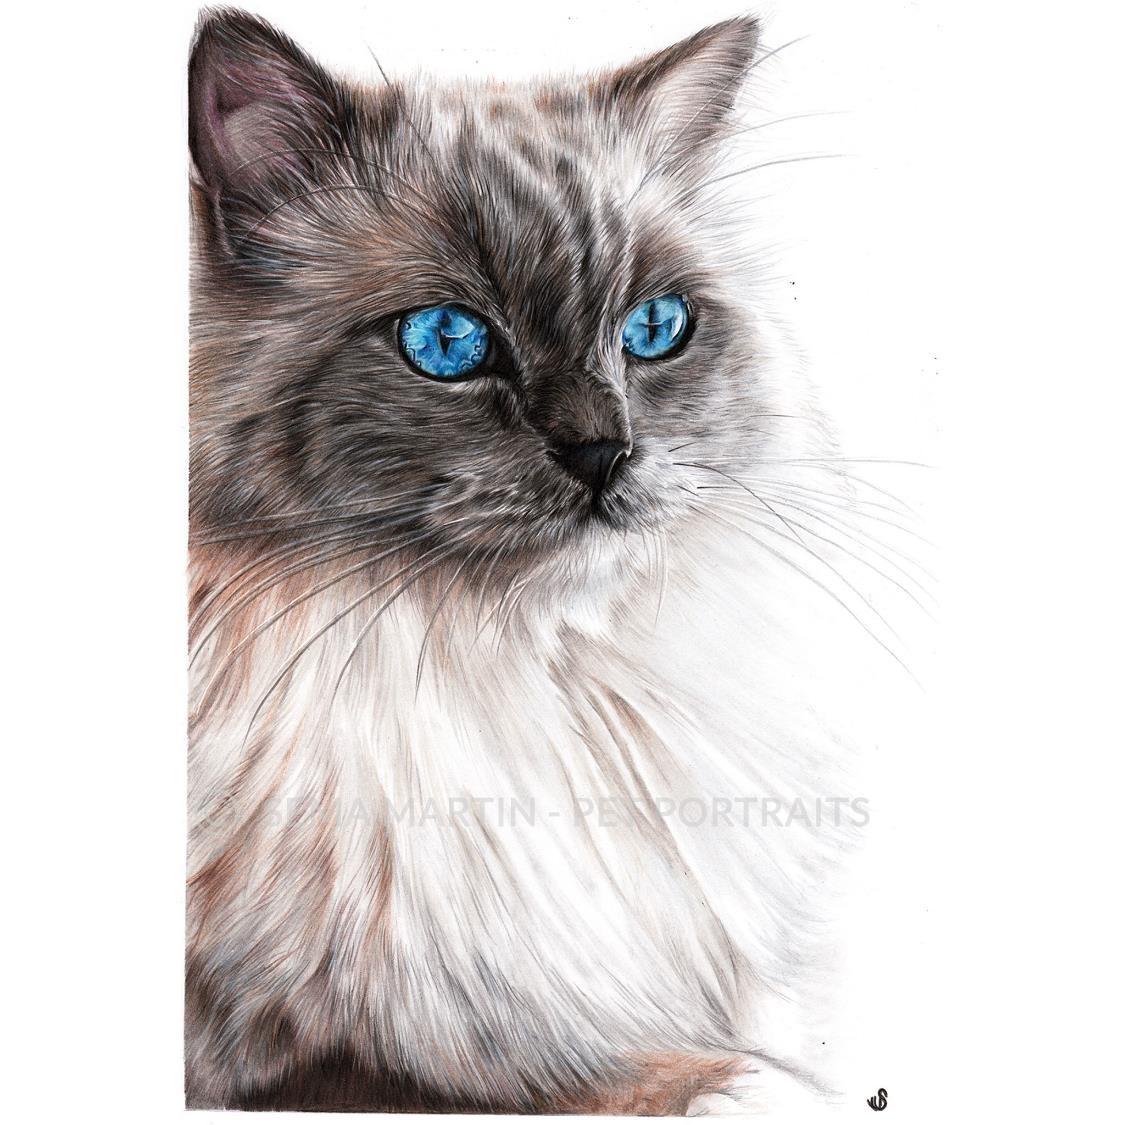 'Marvel' - Belgium, 8.3 x 11.7 inches, 2019, Colour Pencil Portrait of Ragdoll Cat